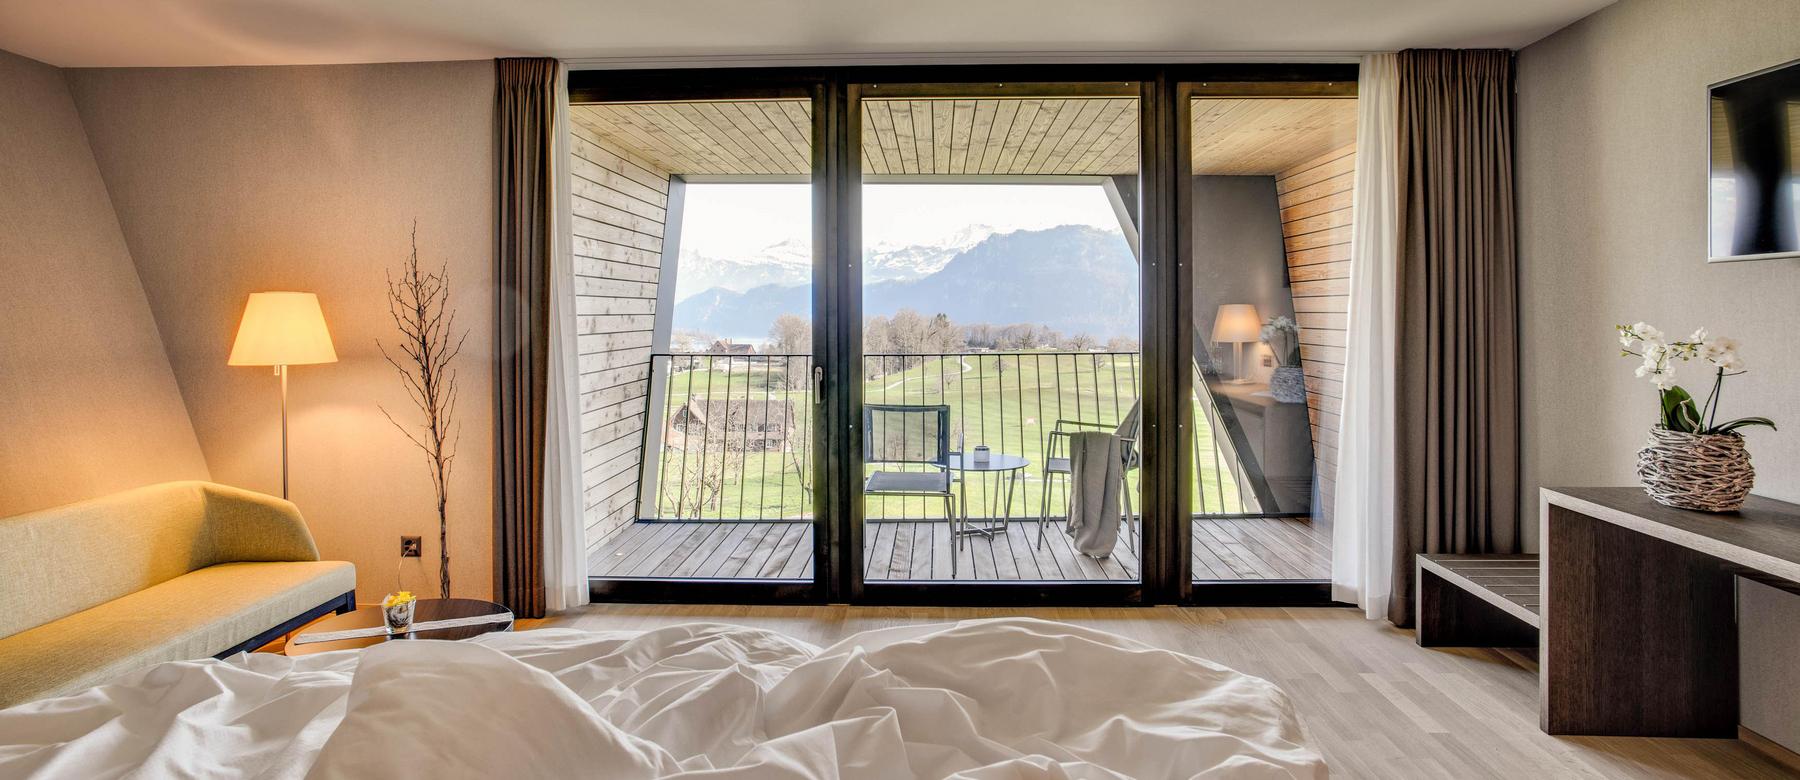 <span class='cycle-icon Gasthaus Badhof'></span><span class='cycle-title'>Gasthaus Badhof</span><span class='cycle-subtitle'>Golf | Gasthaus | Hotel . Meggen, Switzerland</span>